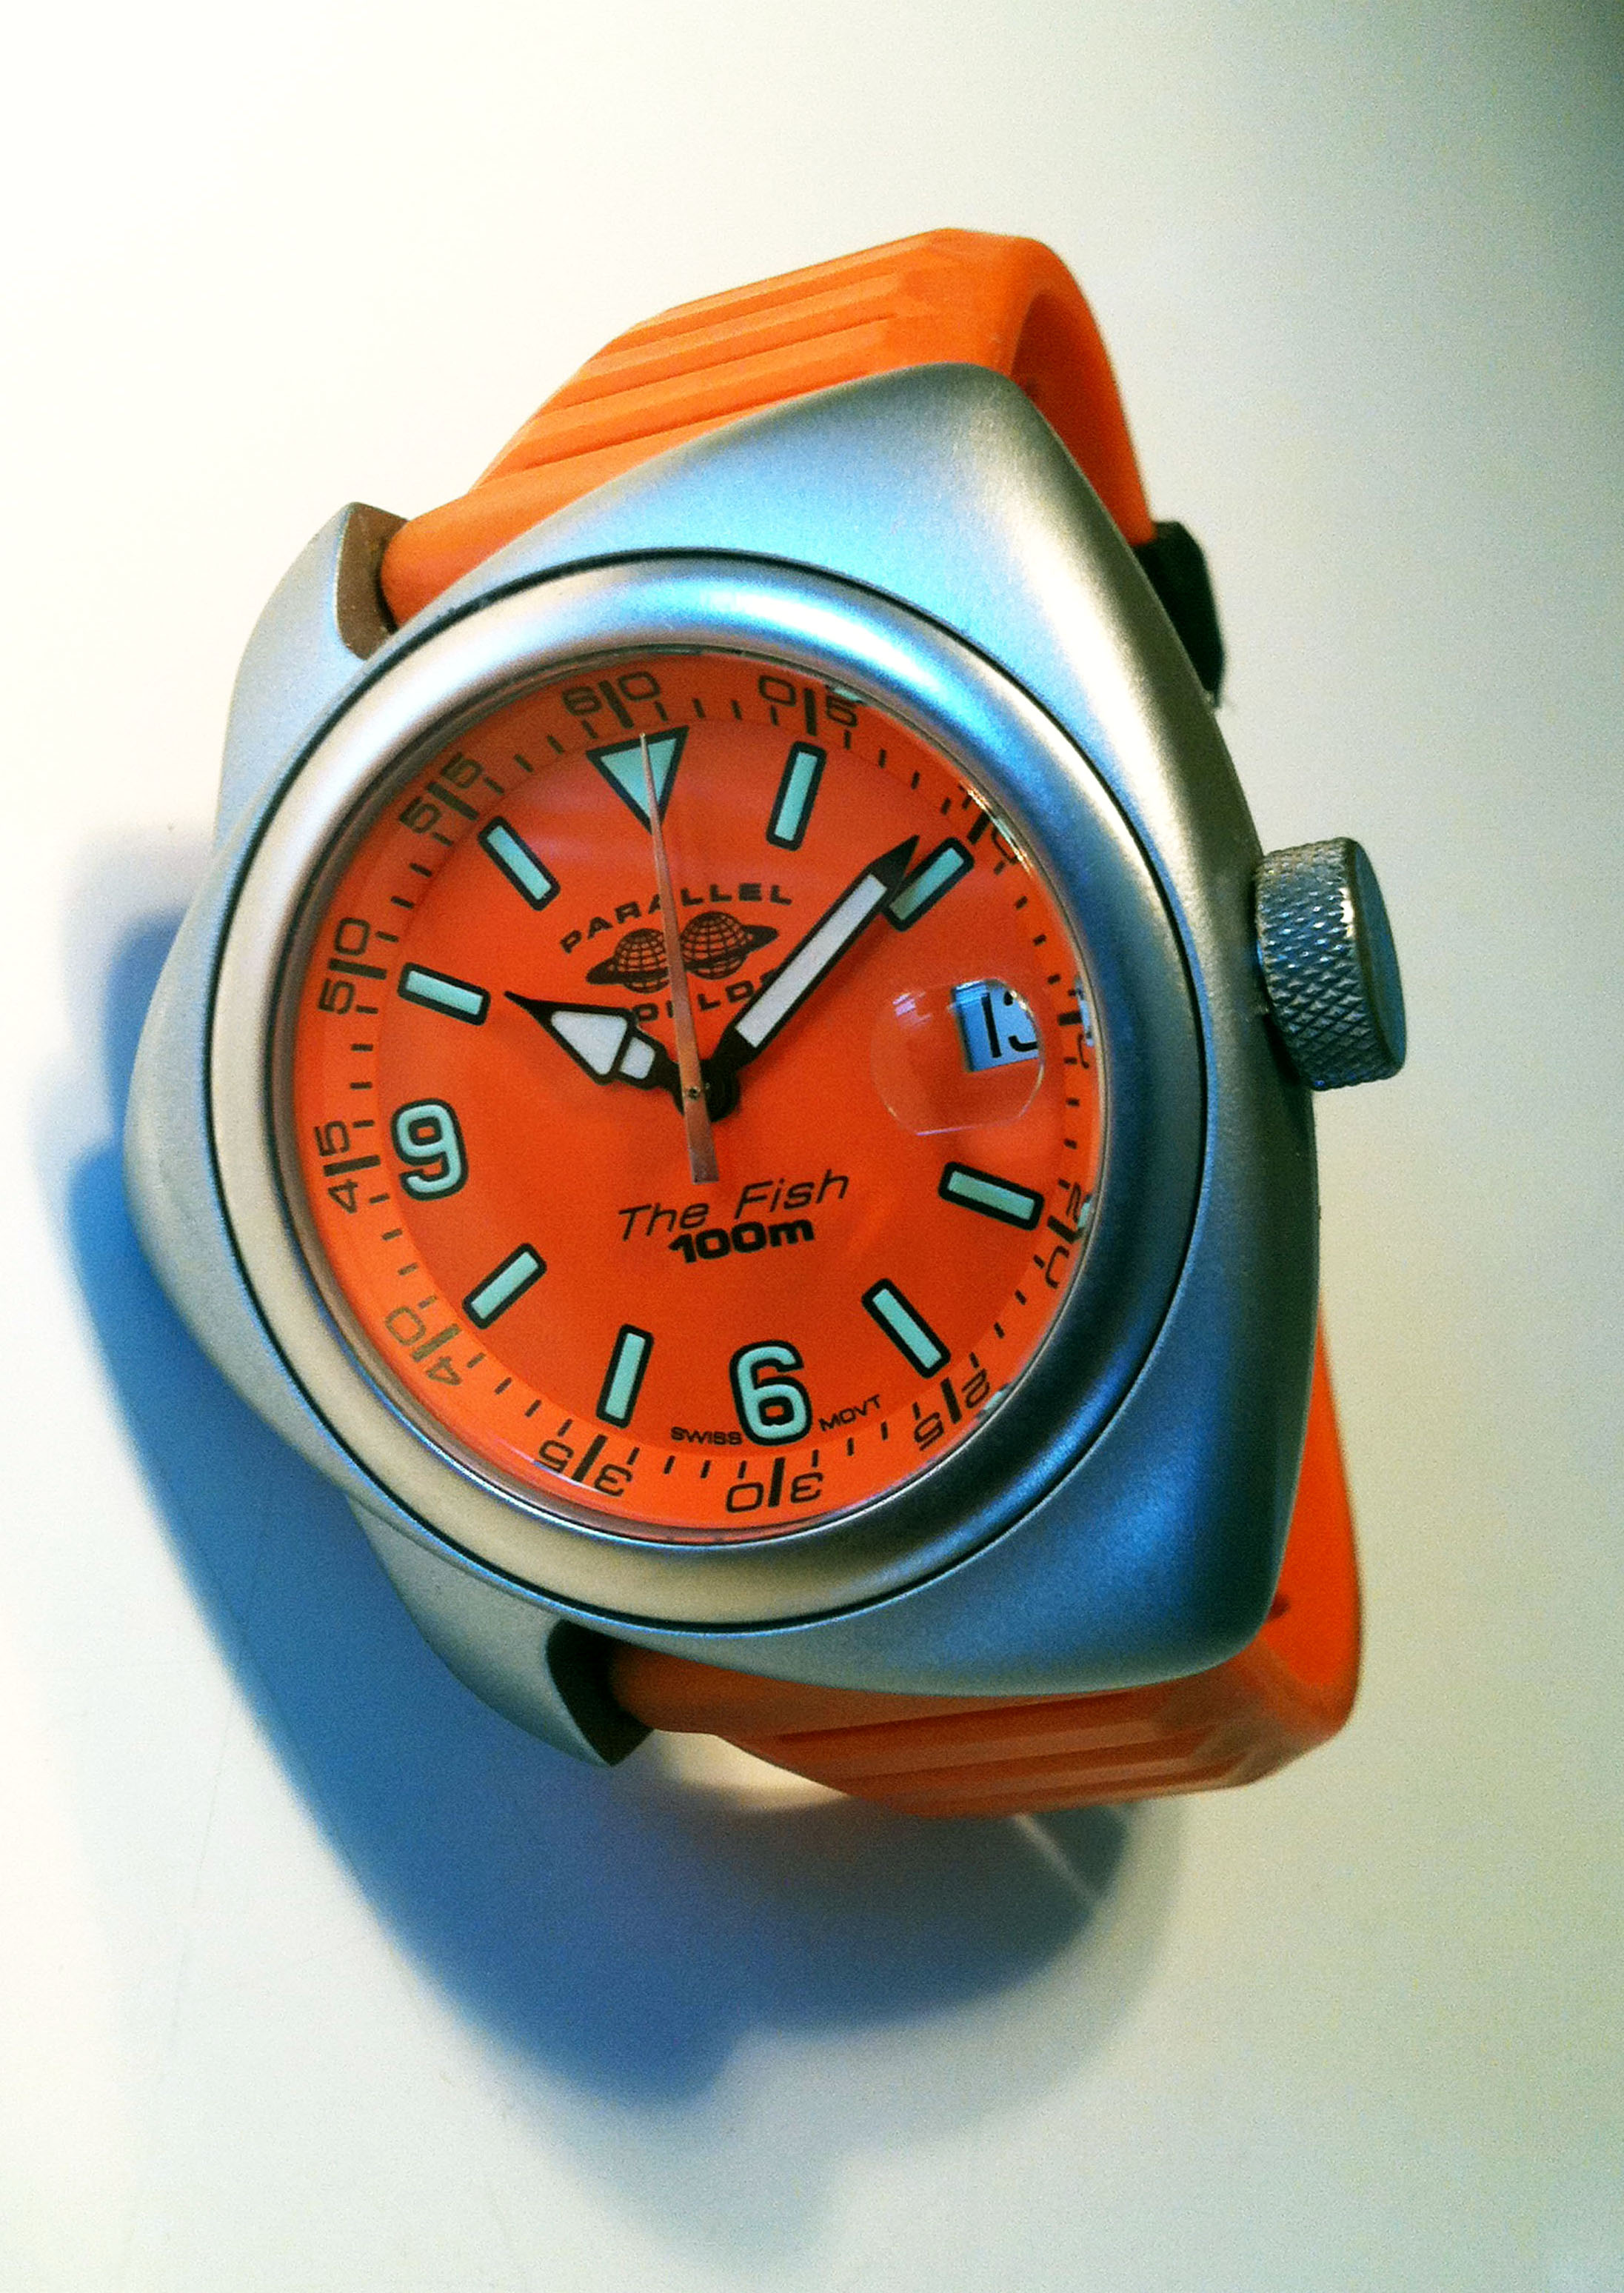 The Fish Orange.jpg